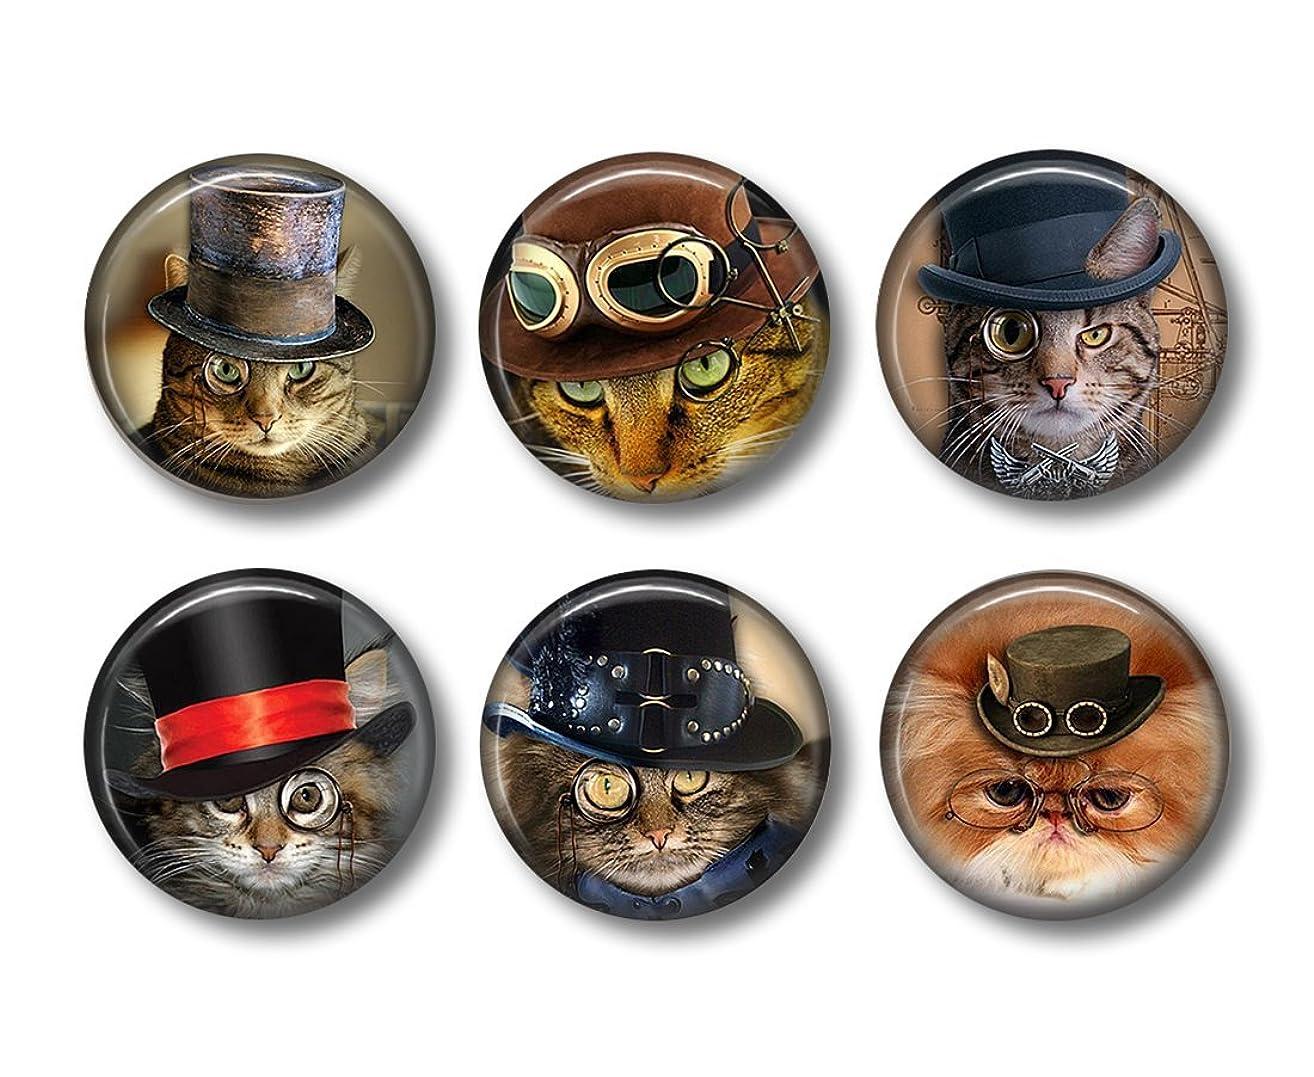 Steampunk Cats - Fridge Magnets - Cat Magnets - 6 Magnets - Steampunk Magnets - 1.5 Inch Magnets - Kitchen Magnets